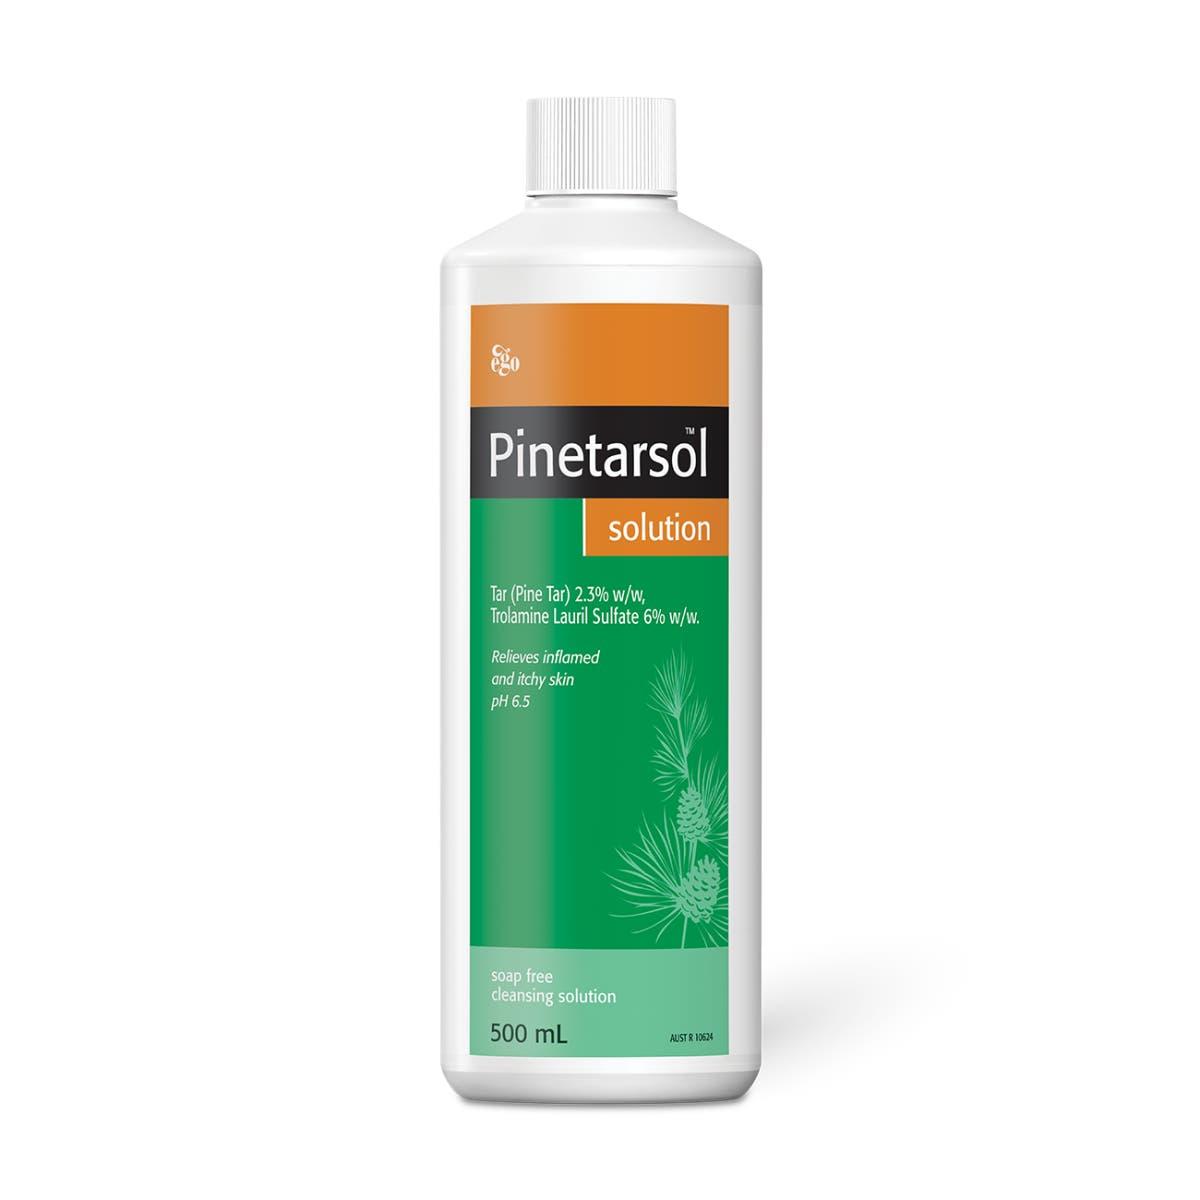 Pinetarsol Solution 500mL